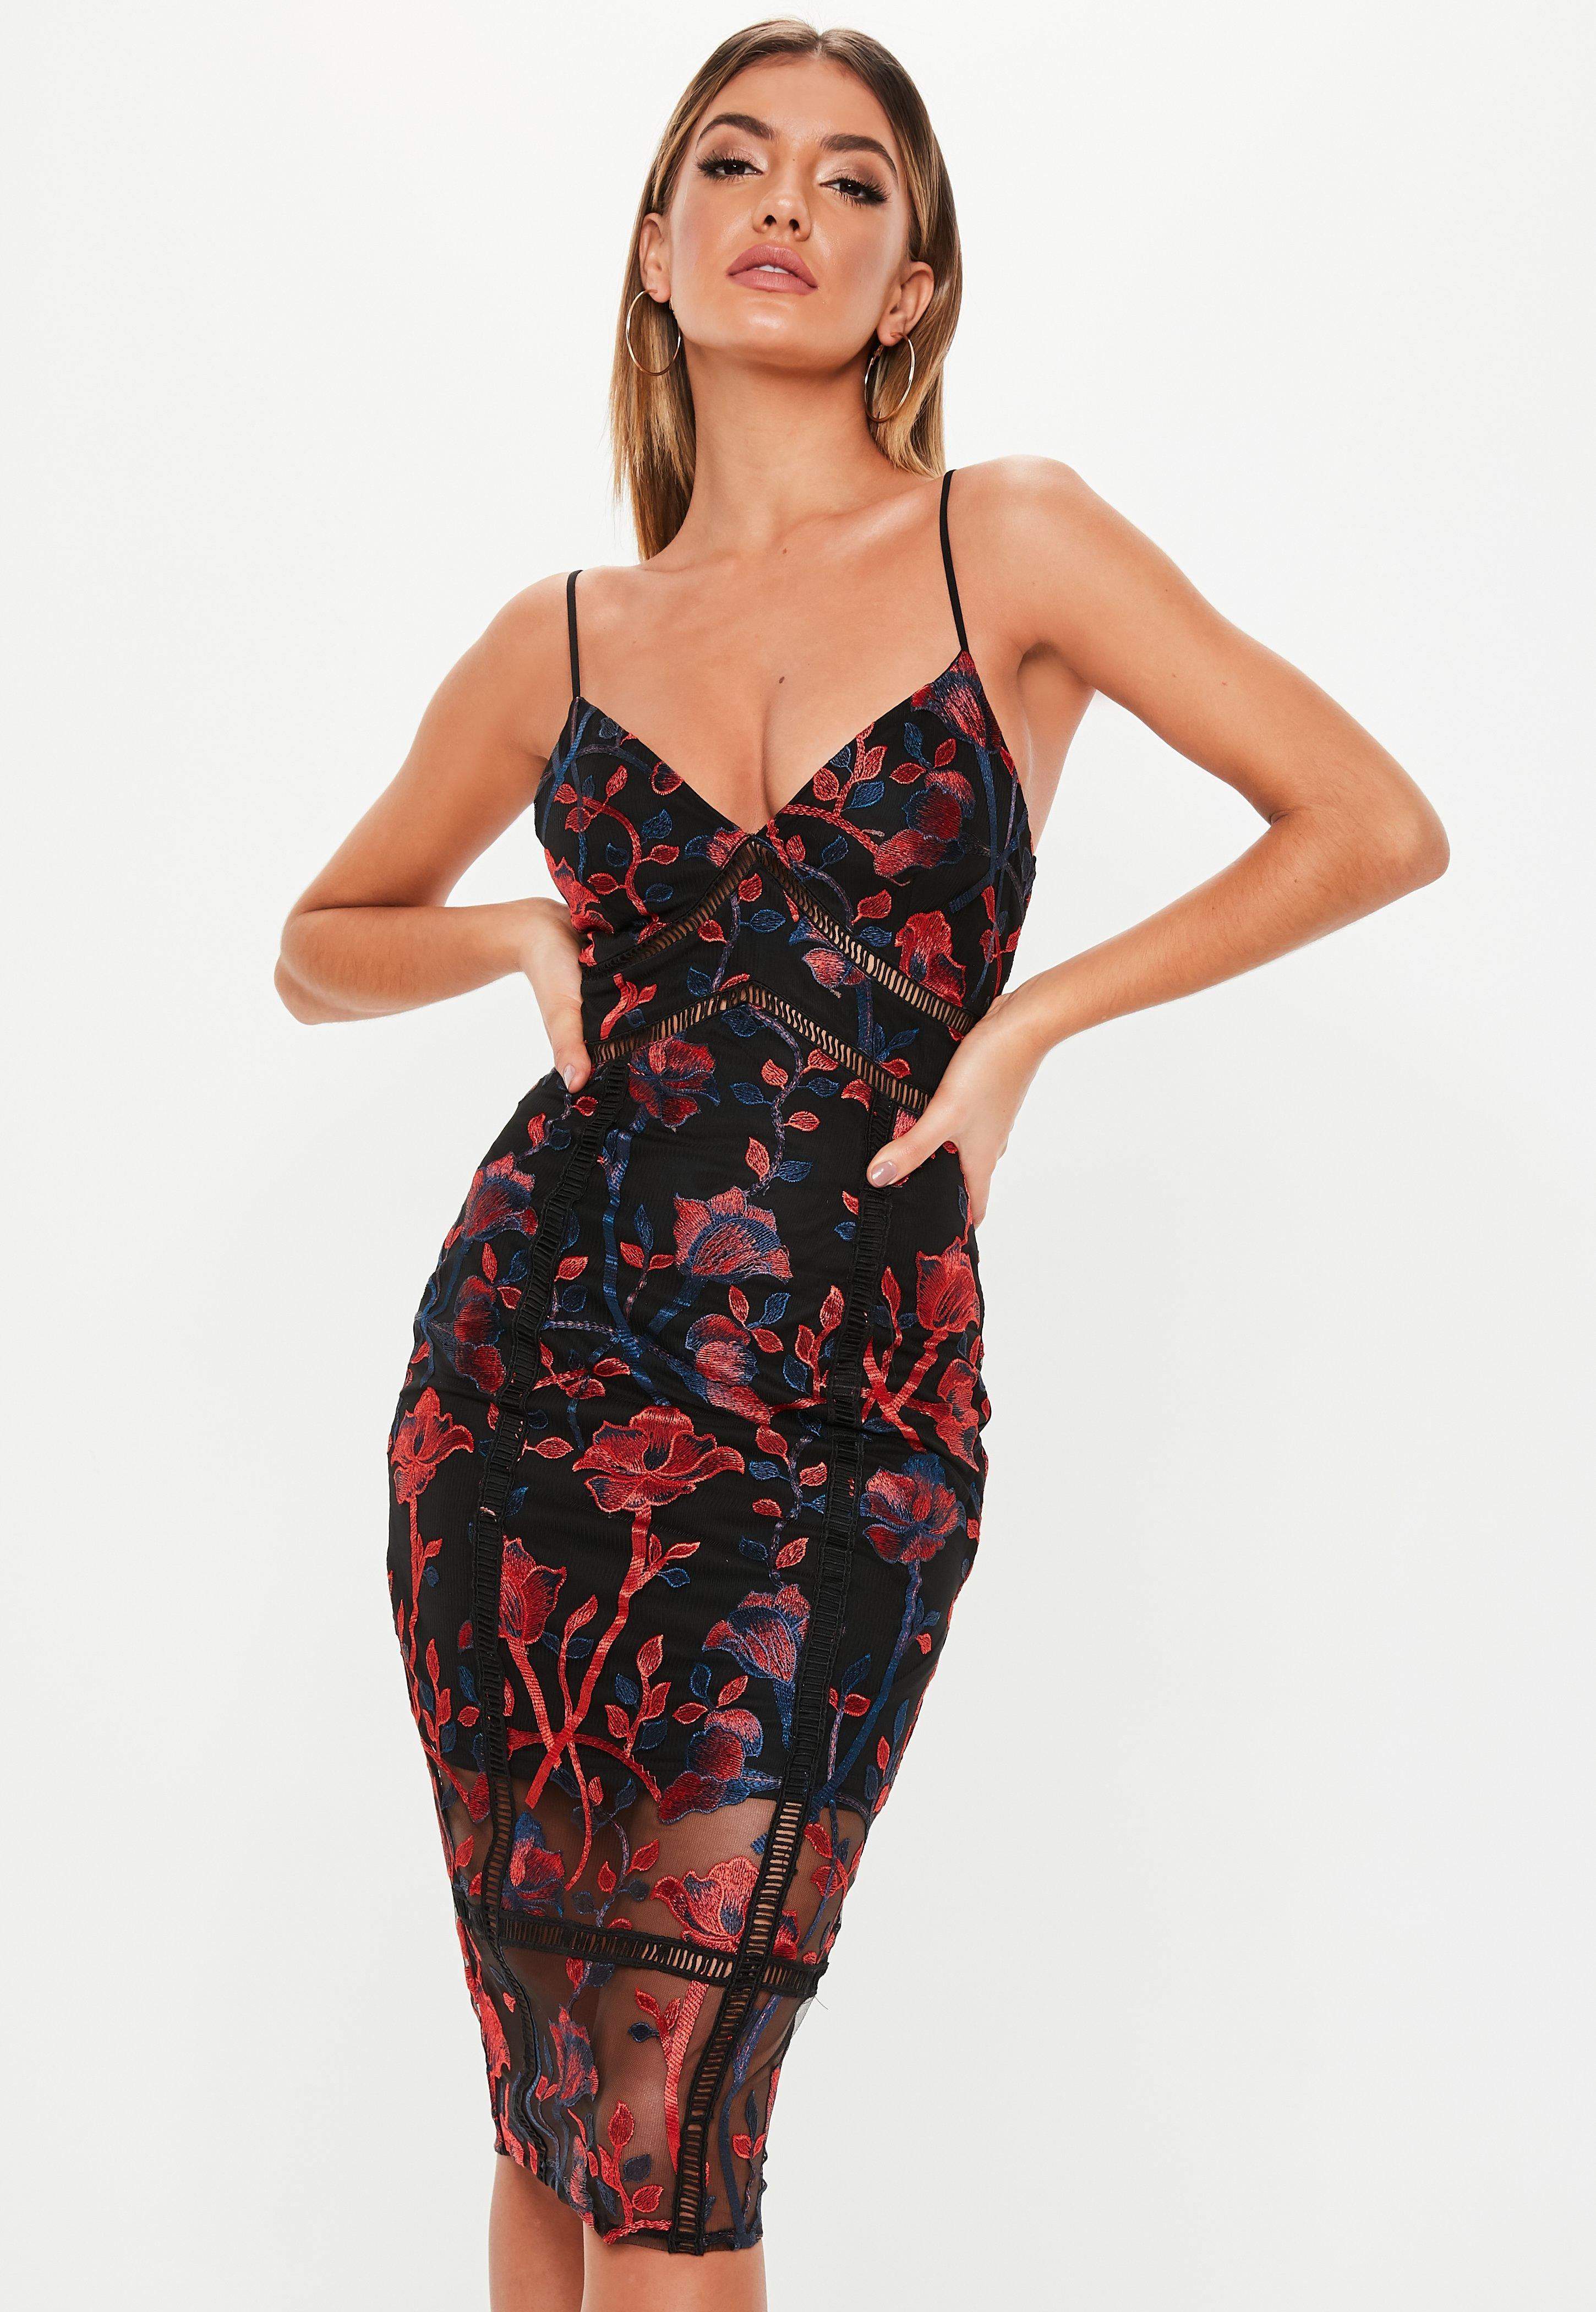 832f8359b04 Floral Dresses - Flowery   Printed Dresses Online